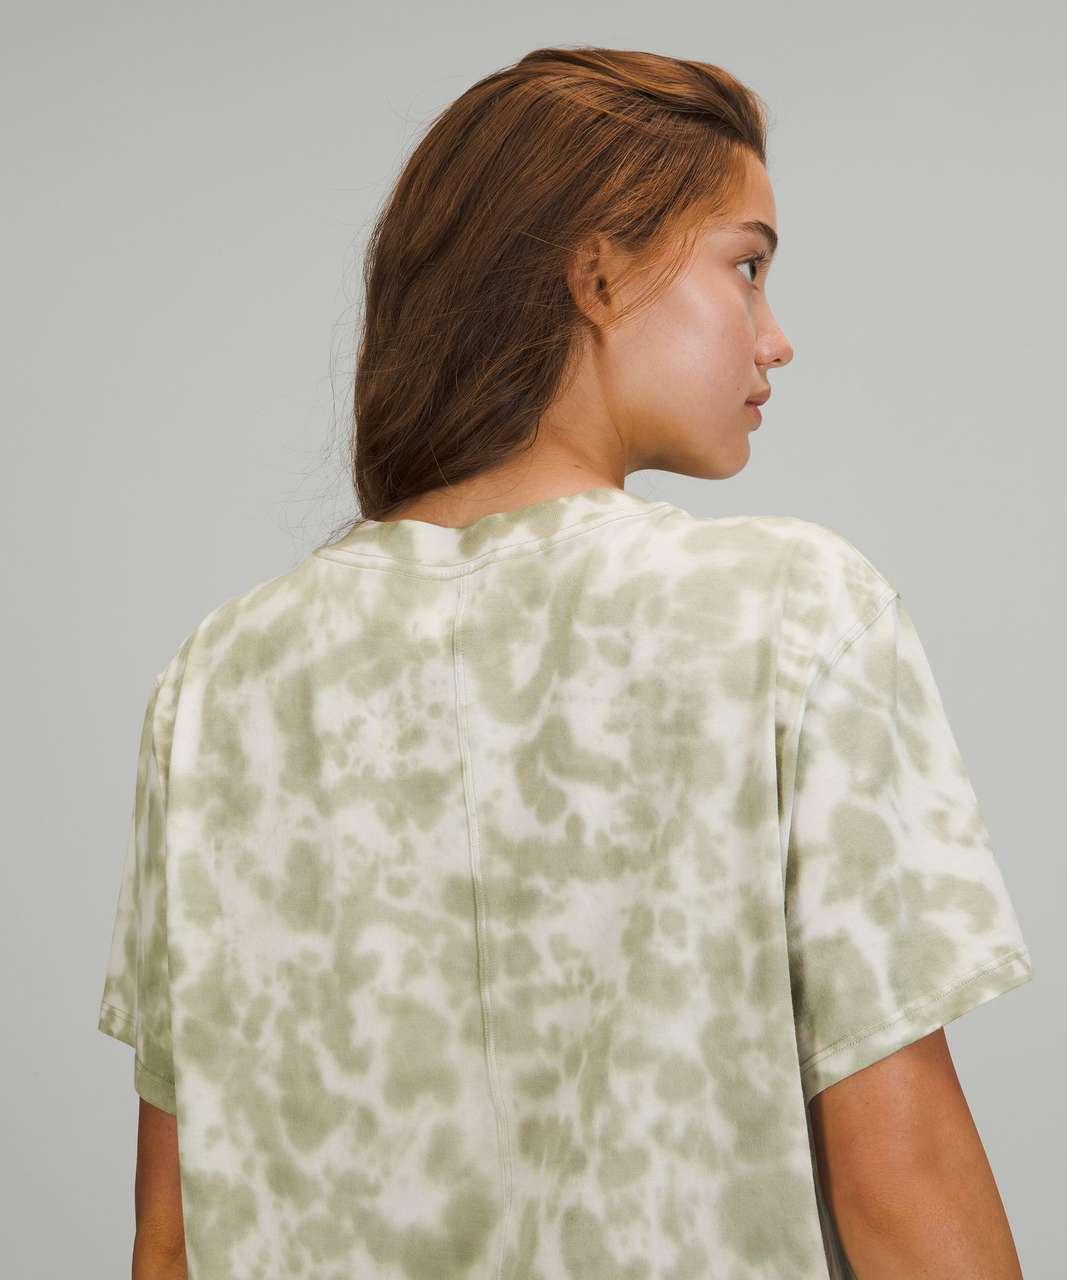 Lululemon All Yours Short Sleeve T-Shirt - Marmoleado Tie Dye White Opal Rosemary Green